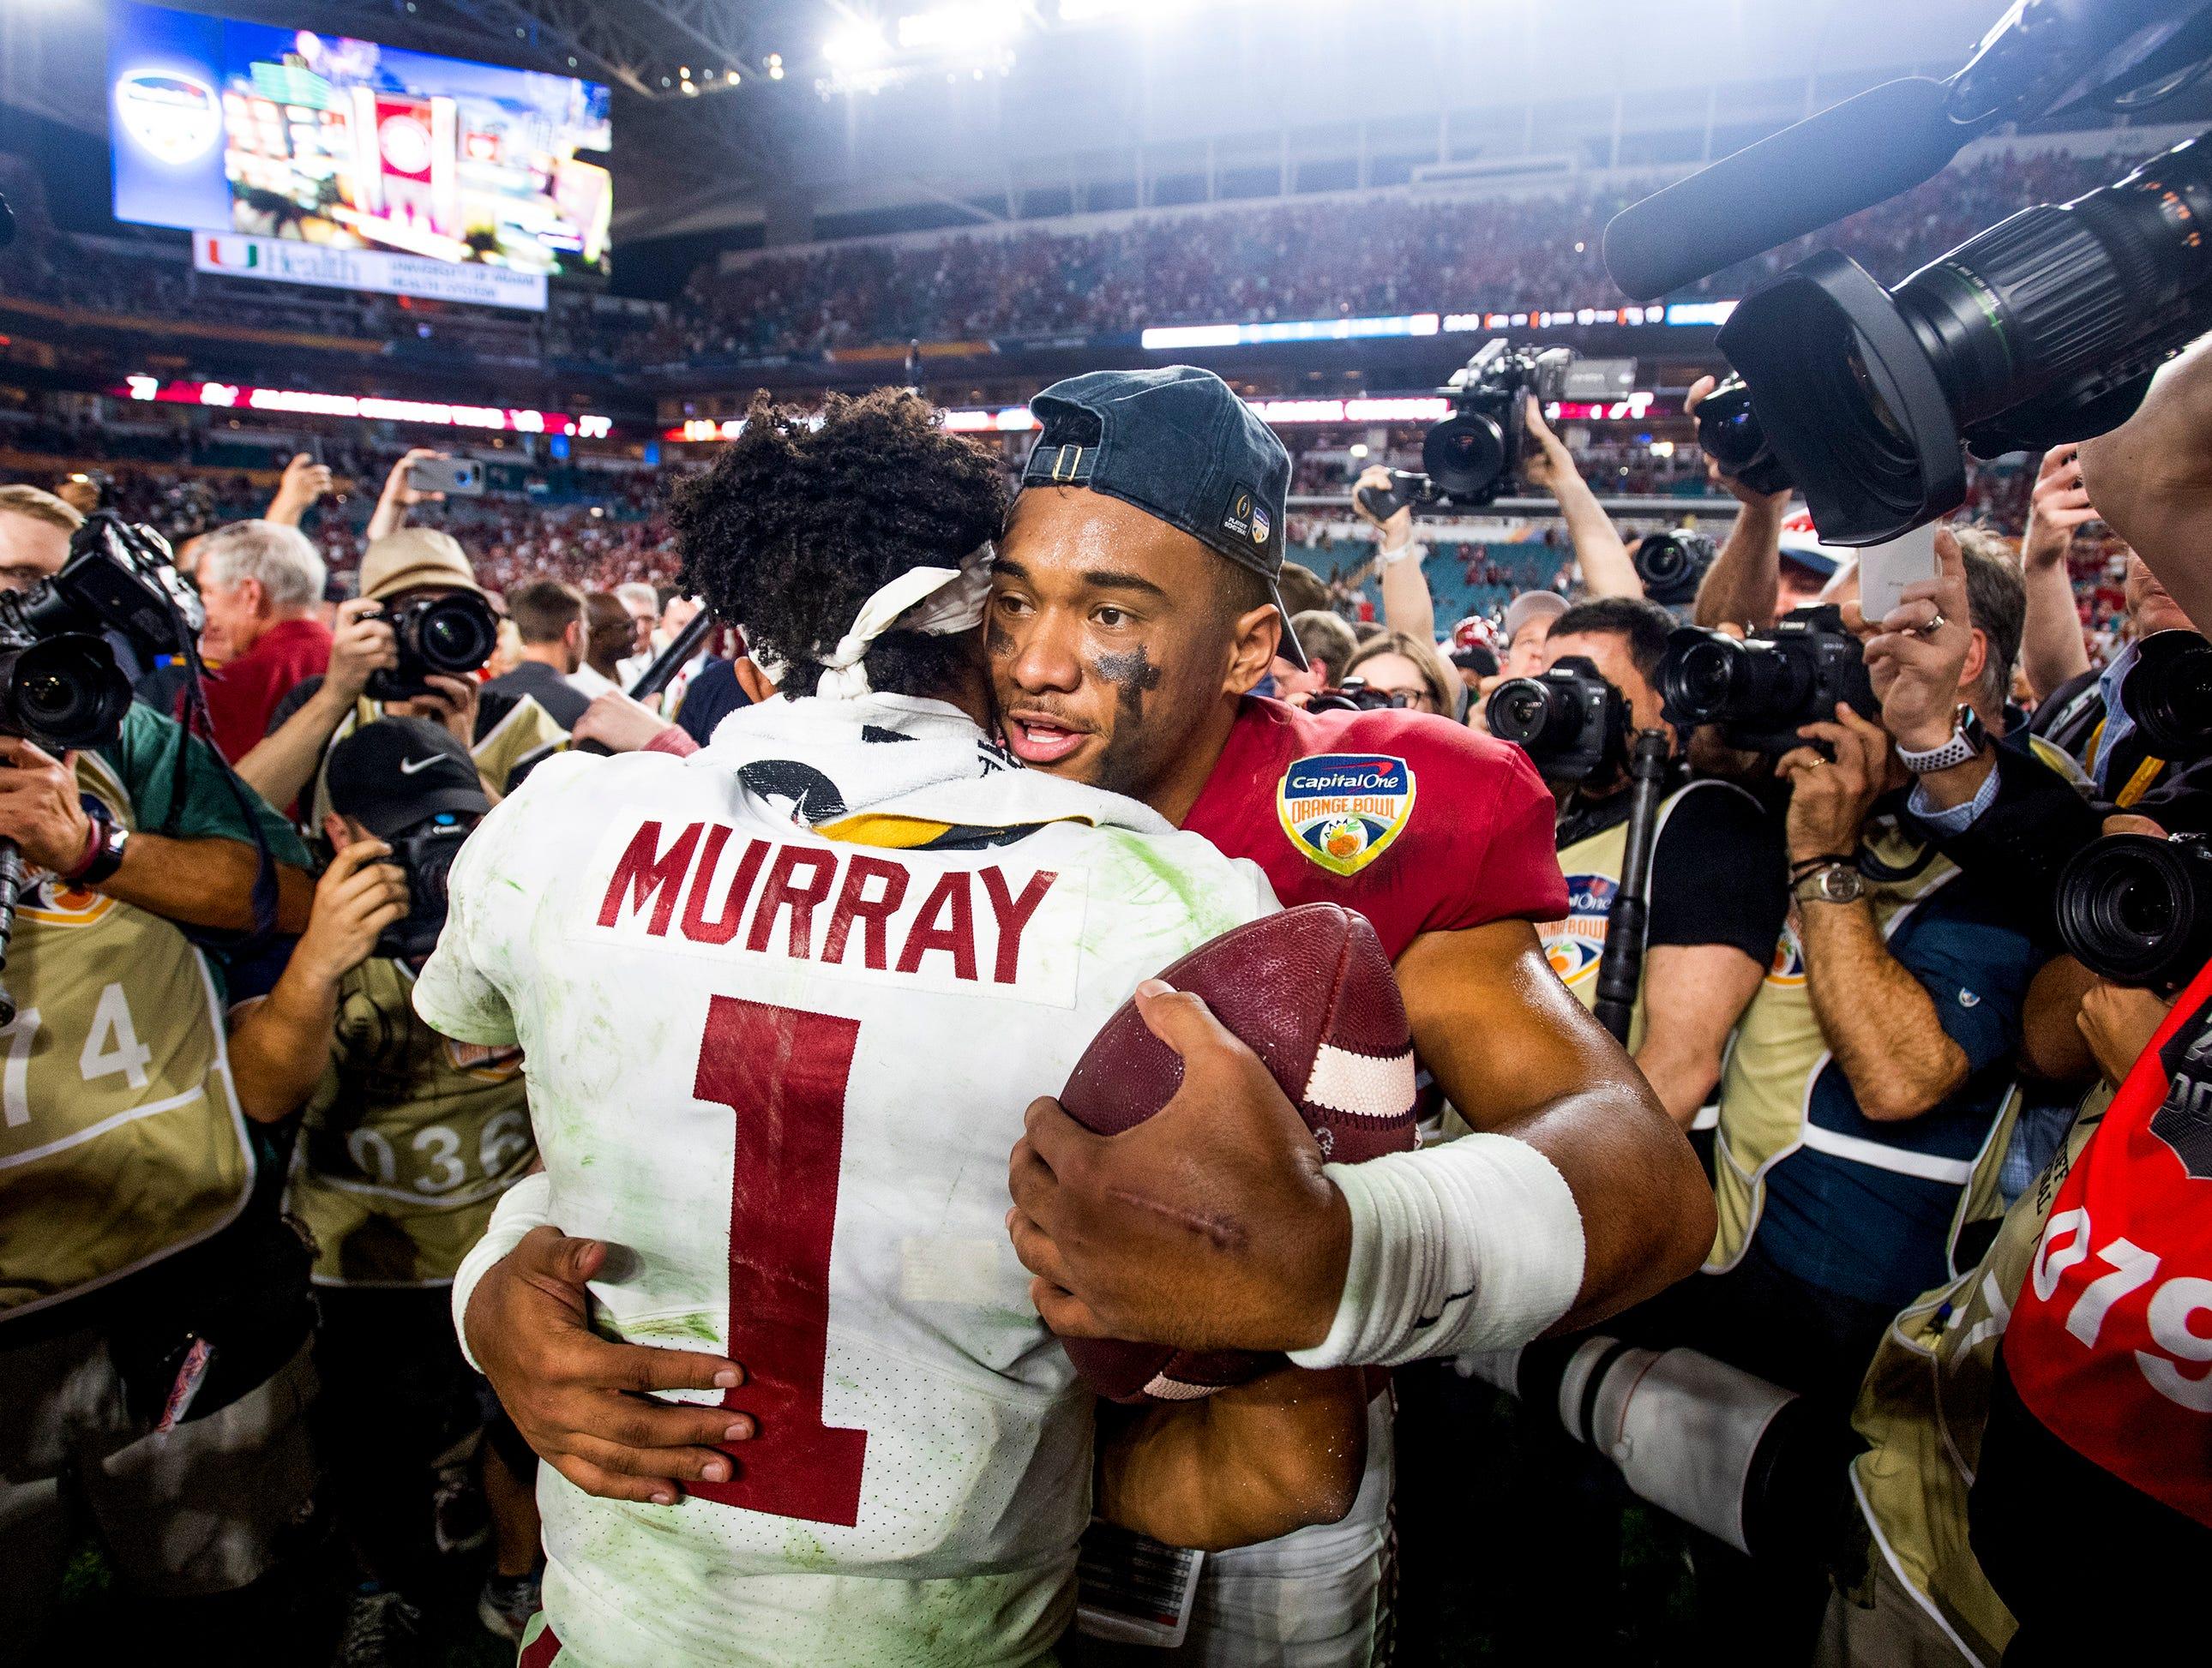 Alabama quarterback Tua Tagovailoa (13) hugs and talks with Oklahoma quarterback Kyler Murray (1) after Alabama defeated Oklahoma in the Orange Bowl at Hard Rock Stadium in Miami Gardens, Fla., on Saturday December 29, 2018.